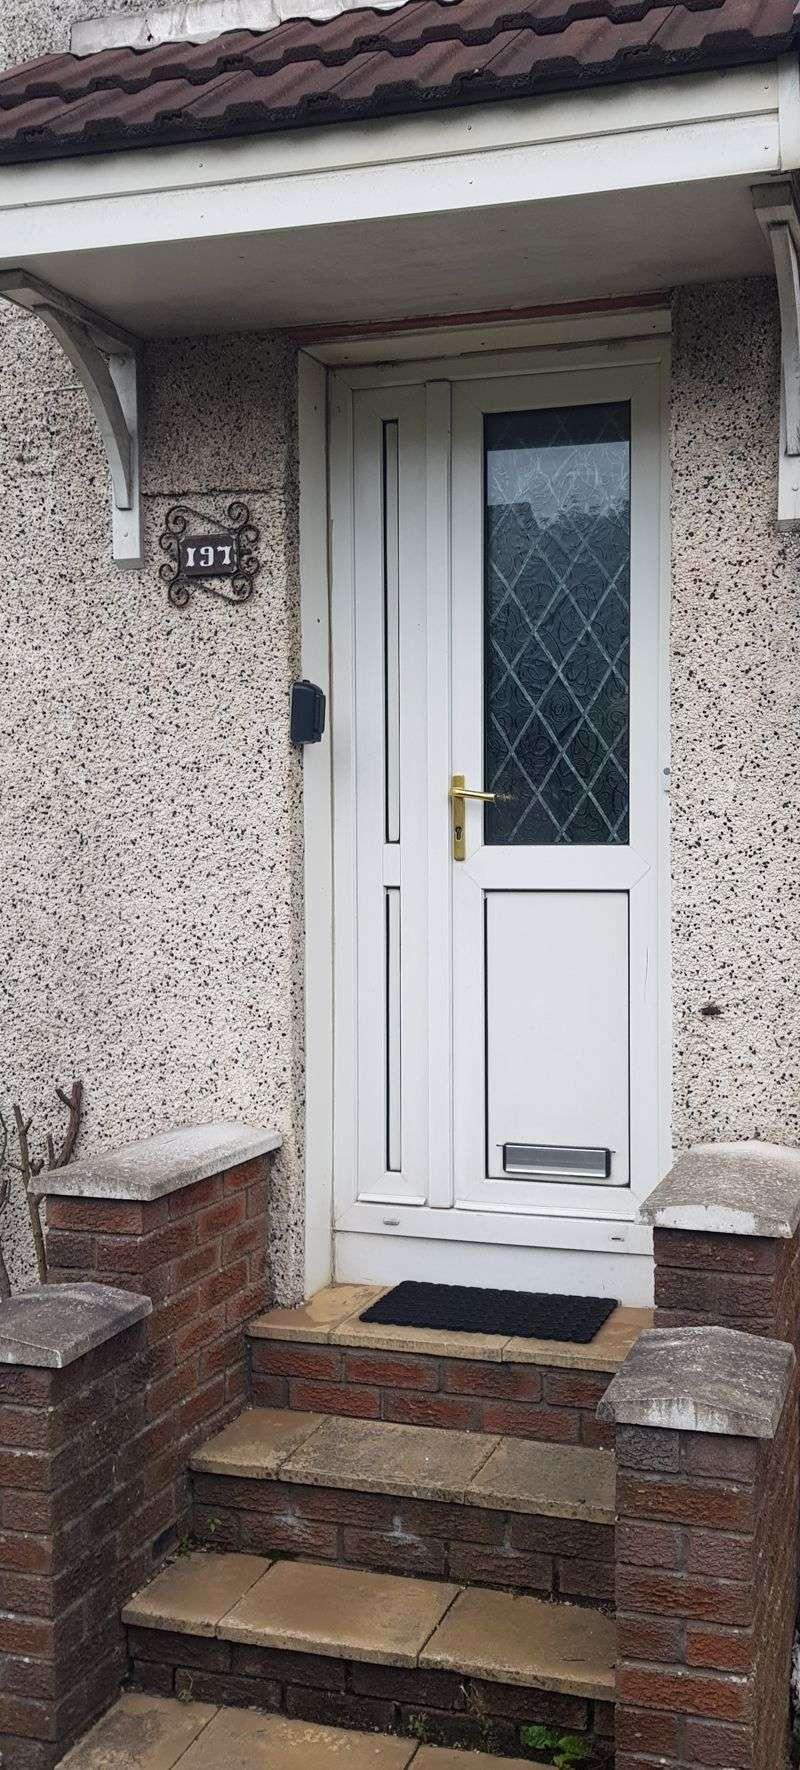 2 Bedrooms Property for sale in Whifflet Street, Coatbridge